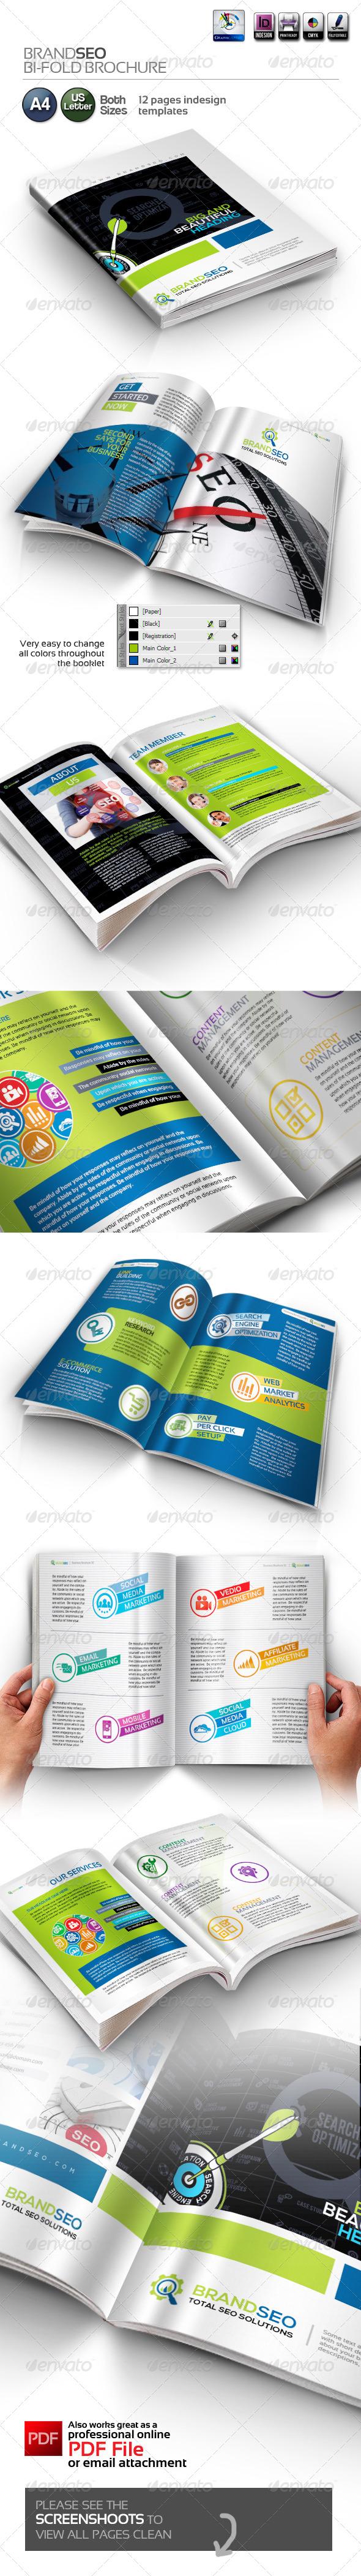 GraphicRiver BrandSEO Bi-fold Creative Brochure 4183802